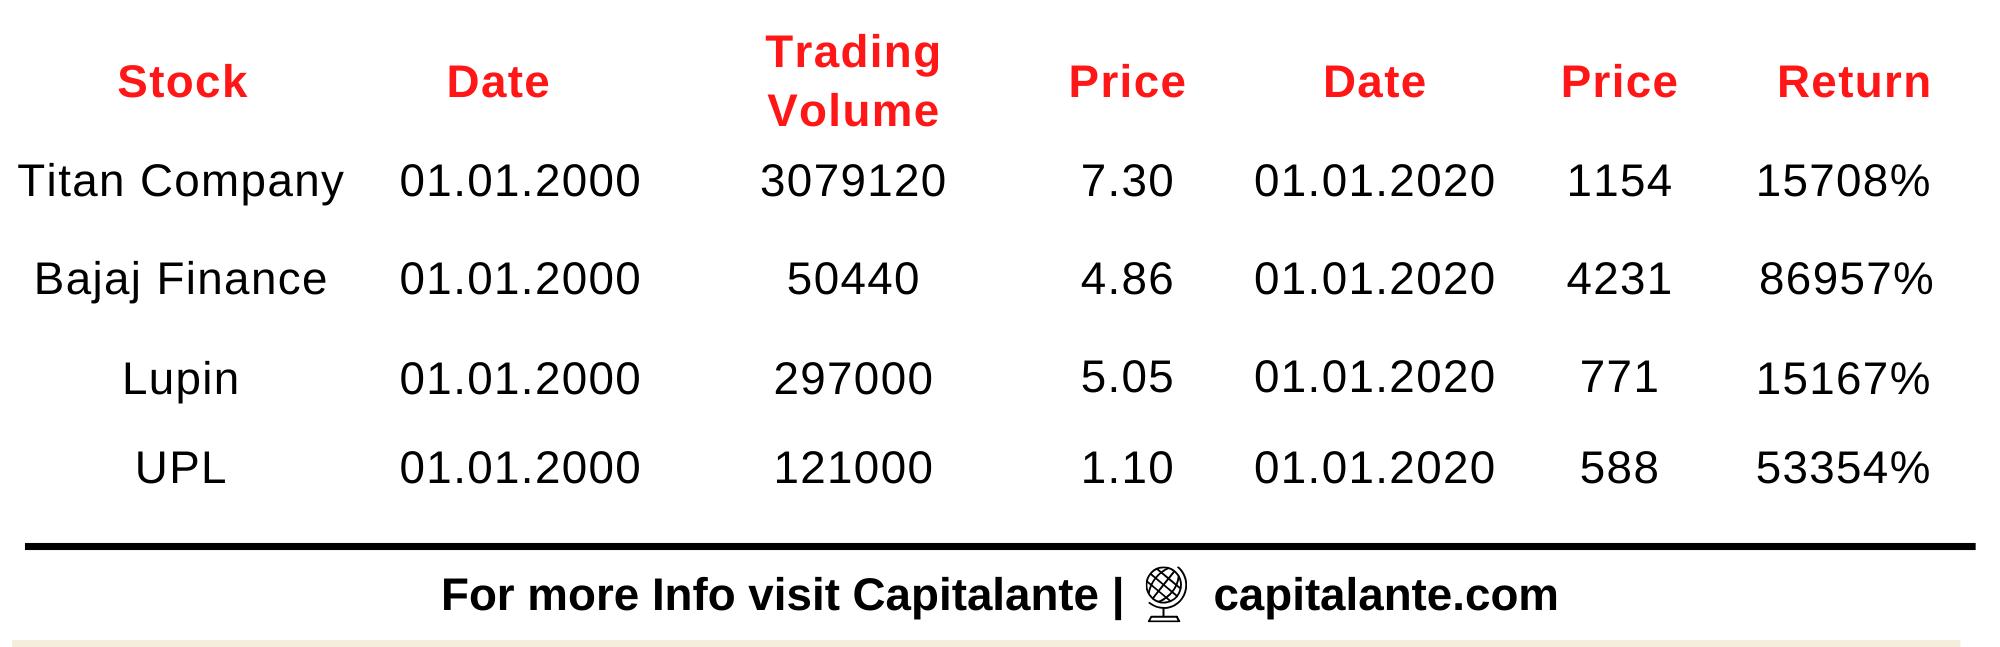 Penny Stocks to buy - Stock Delivered Multibagger return